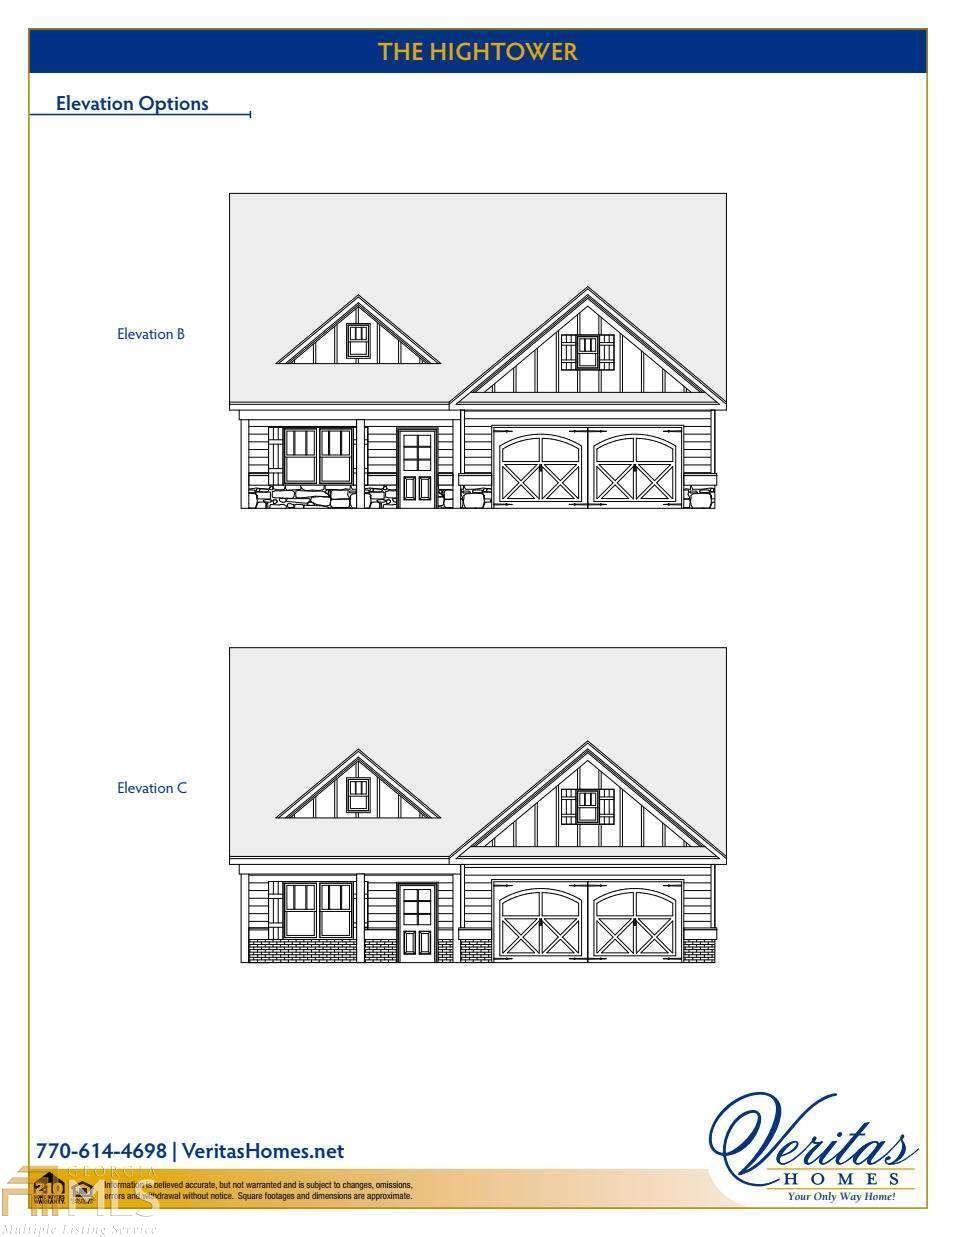 Similar Properties